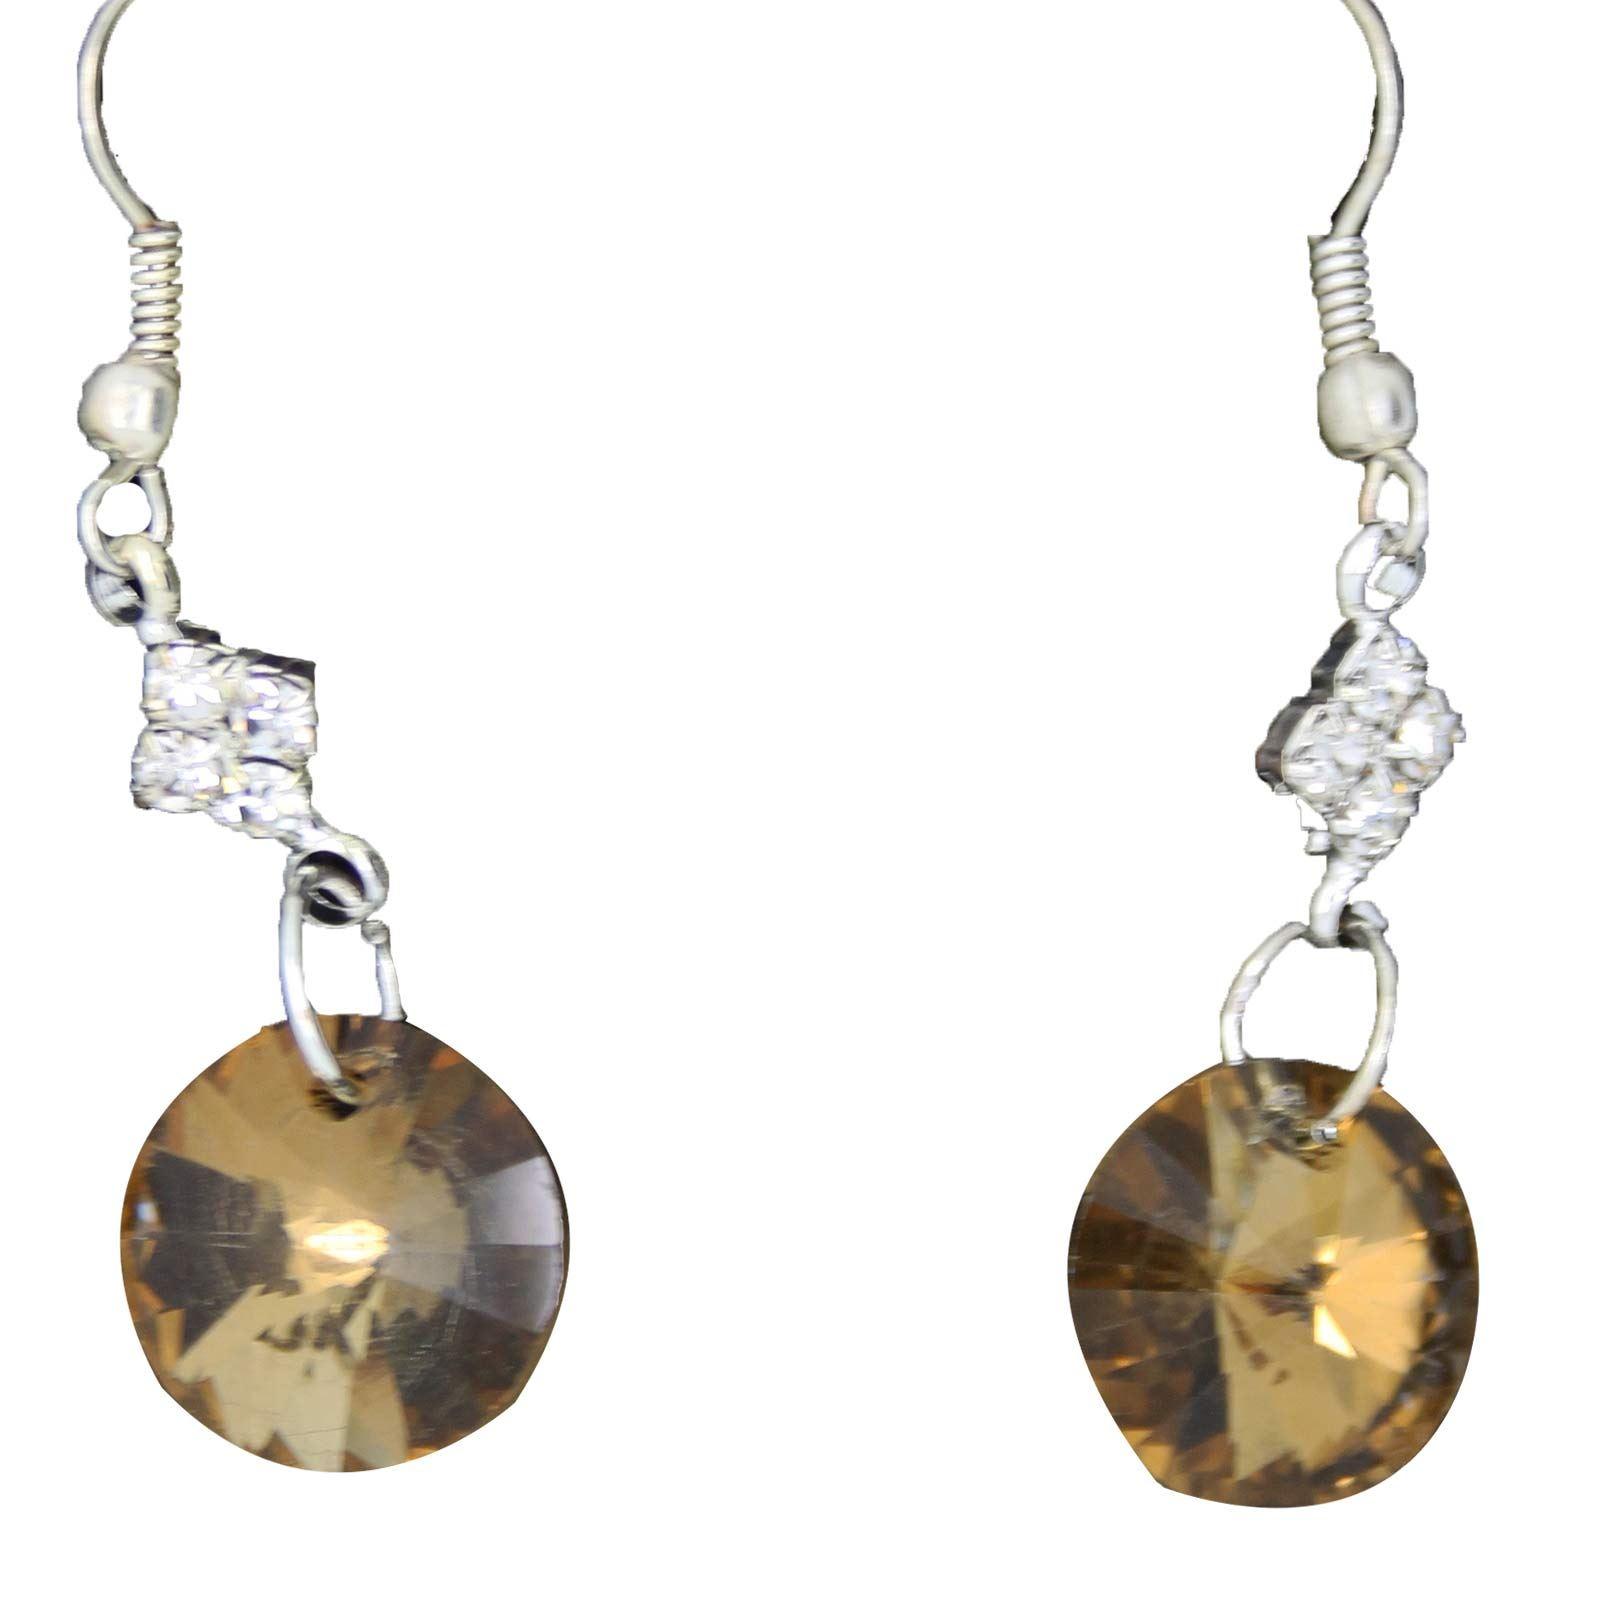 True-Face-Ladies-Women-039-s-Elegant-Earrings-Necklace-Set-Metal-Alloy-Jewellery thumbnail 32